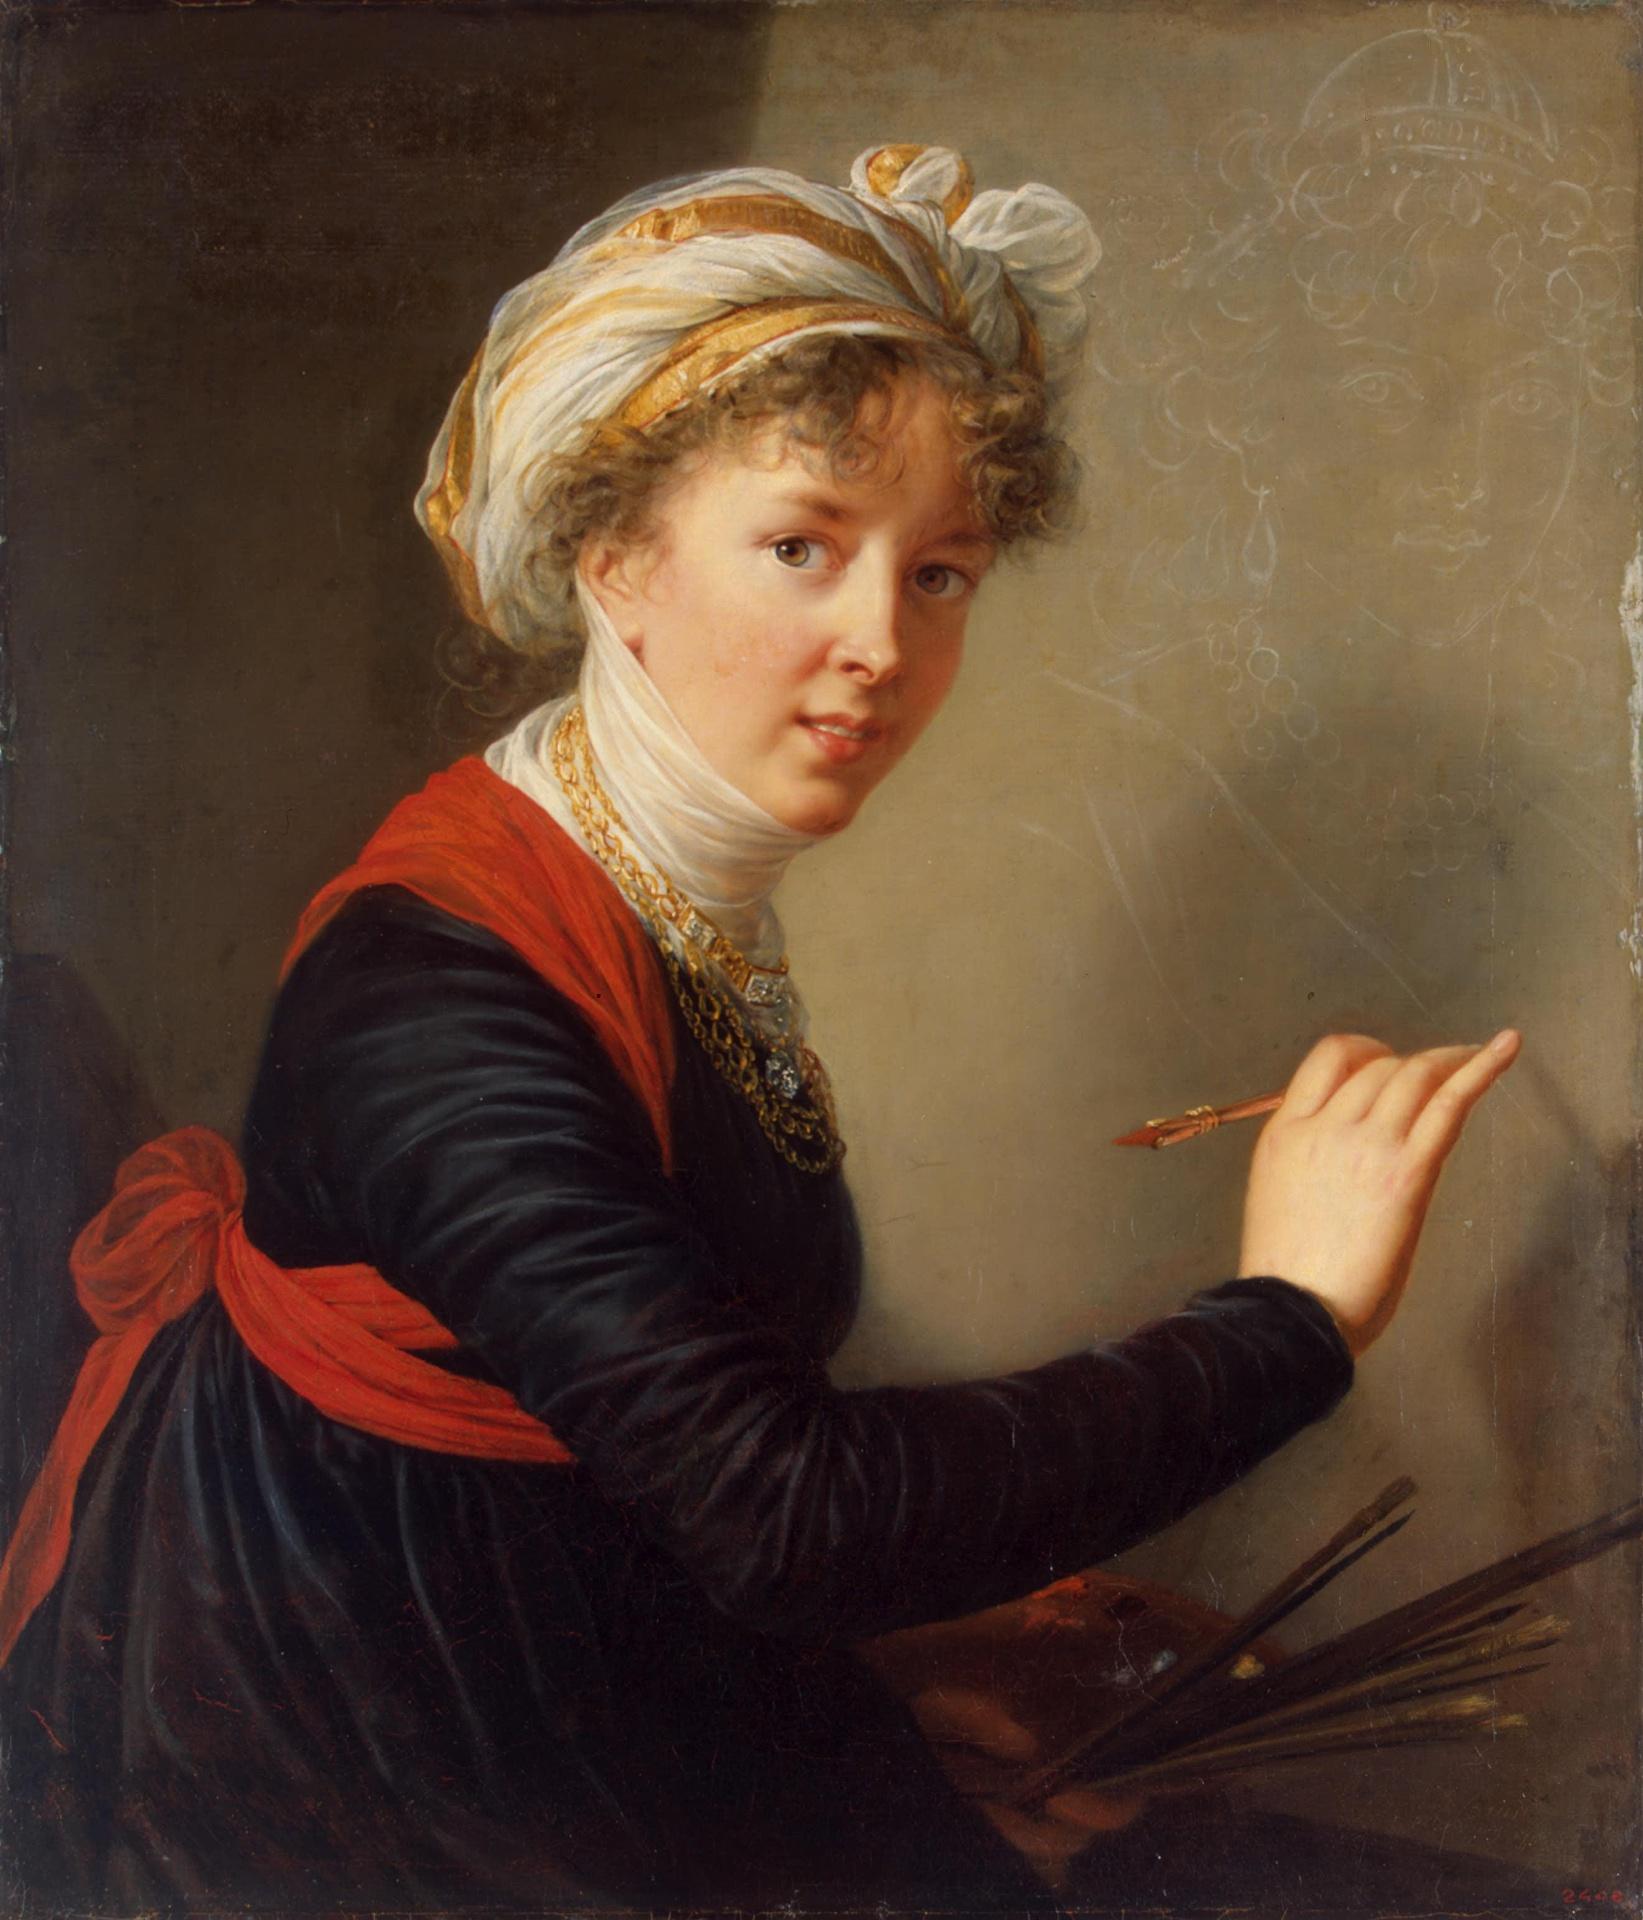 Une femme: Élisabeth Vigée-Lebrun